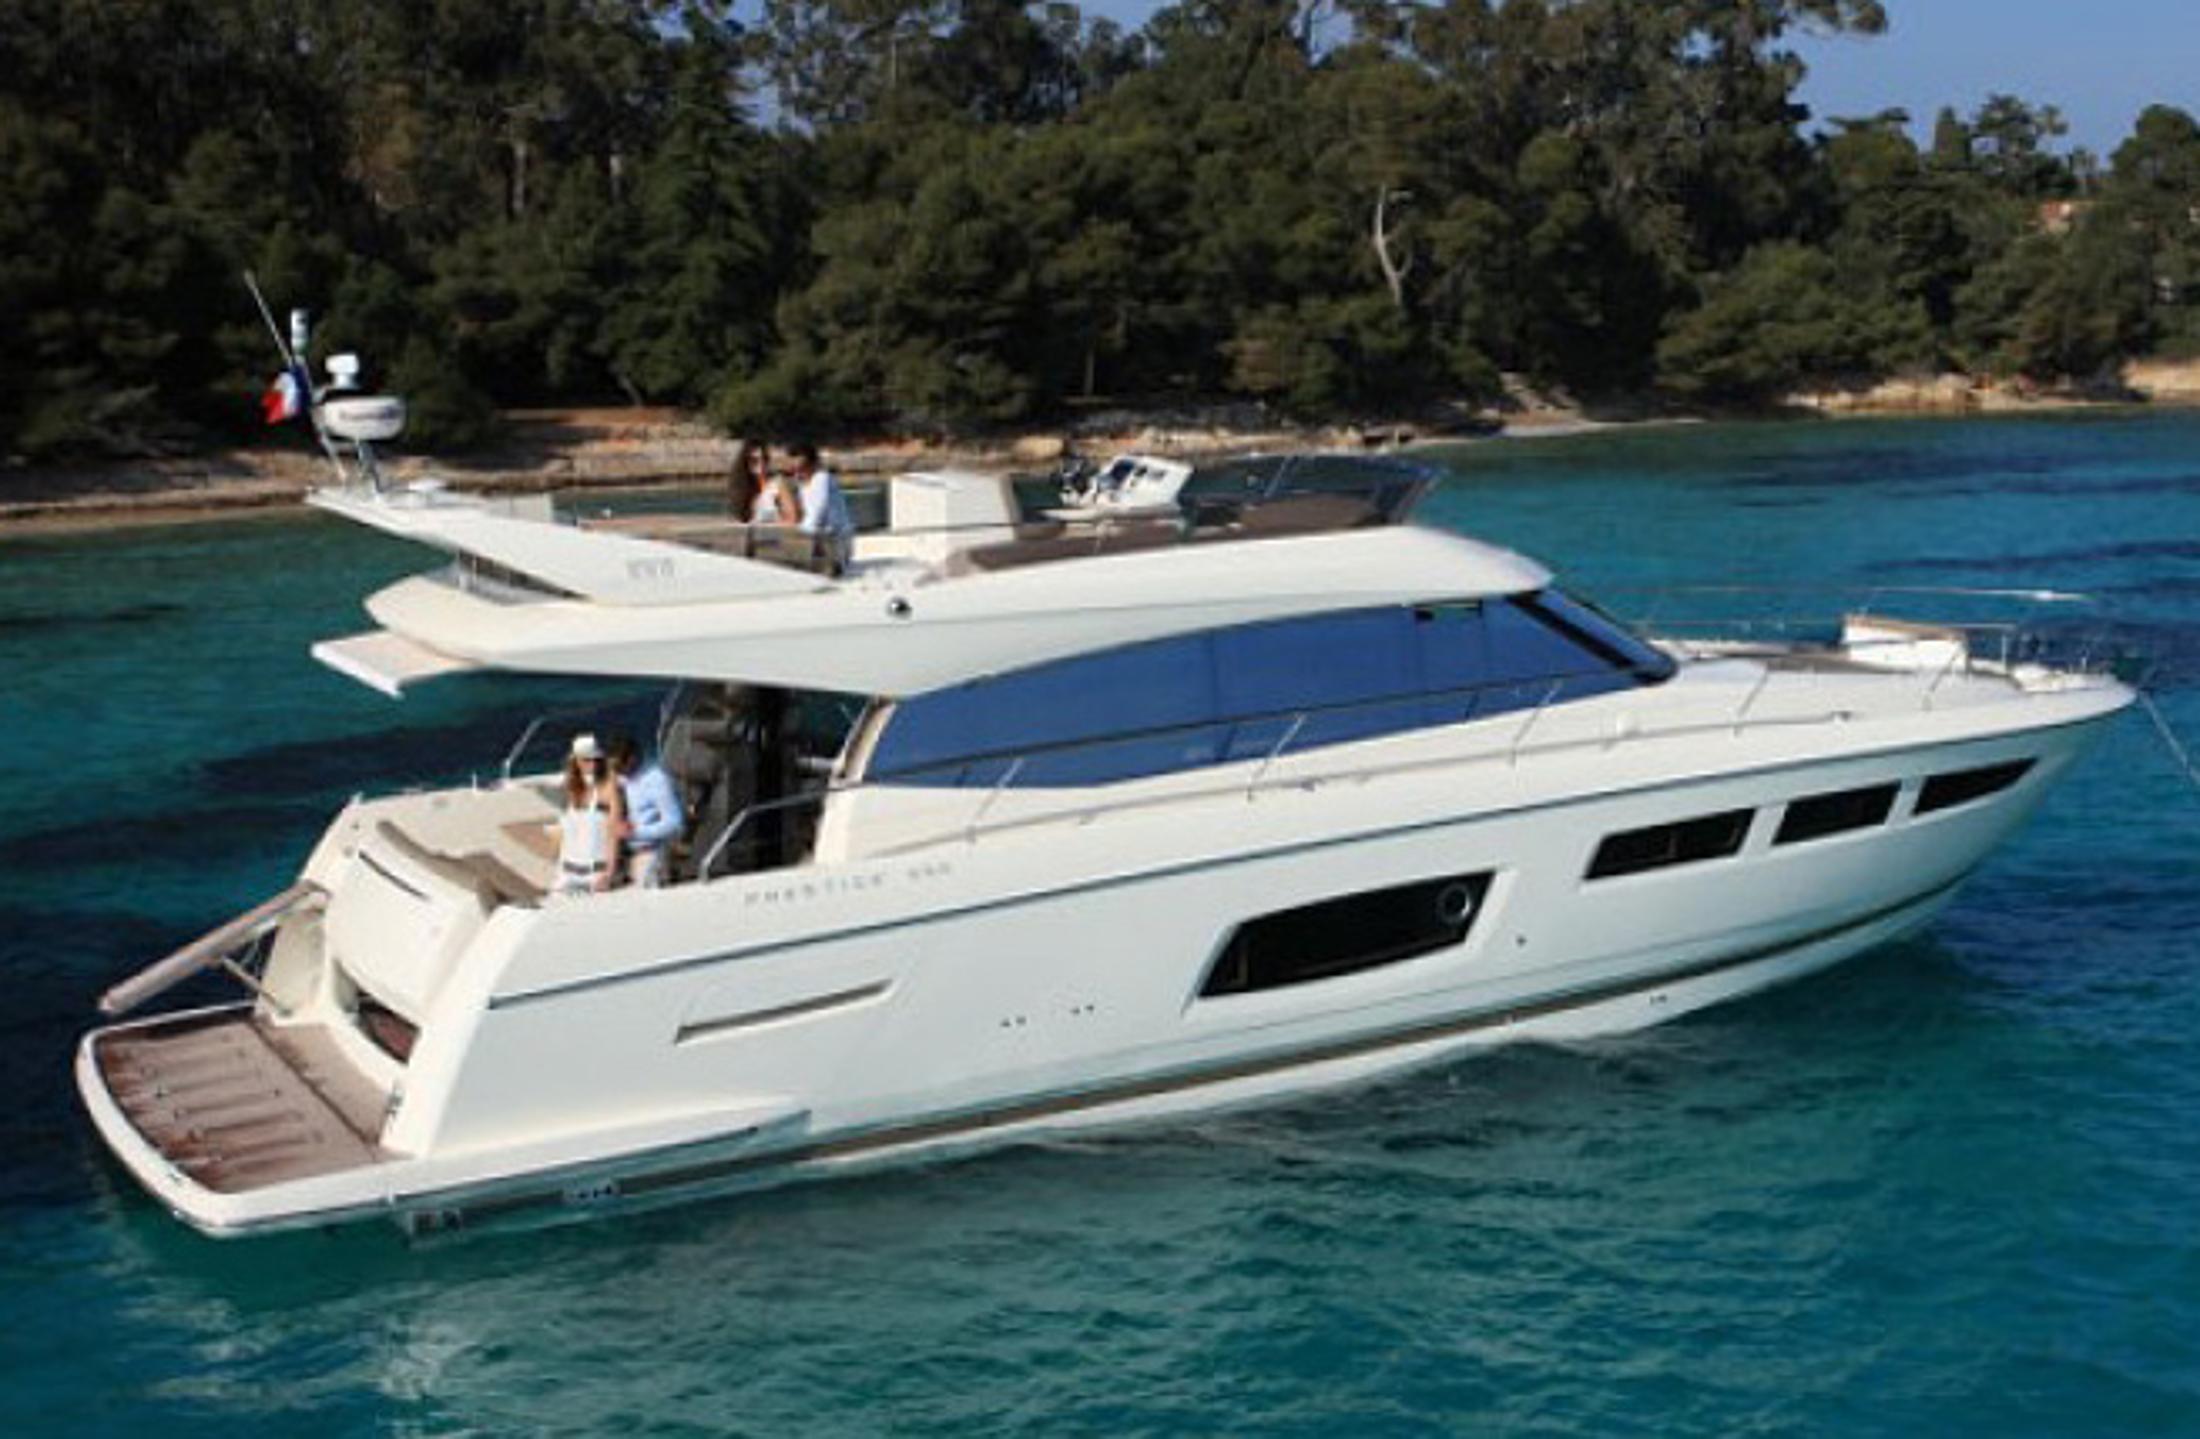 2015 Prestige 550 Power Boat For Sale Wwwyachtworldcom